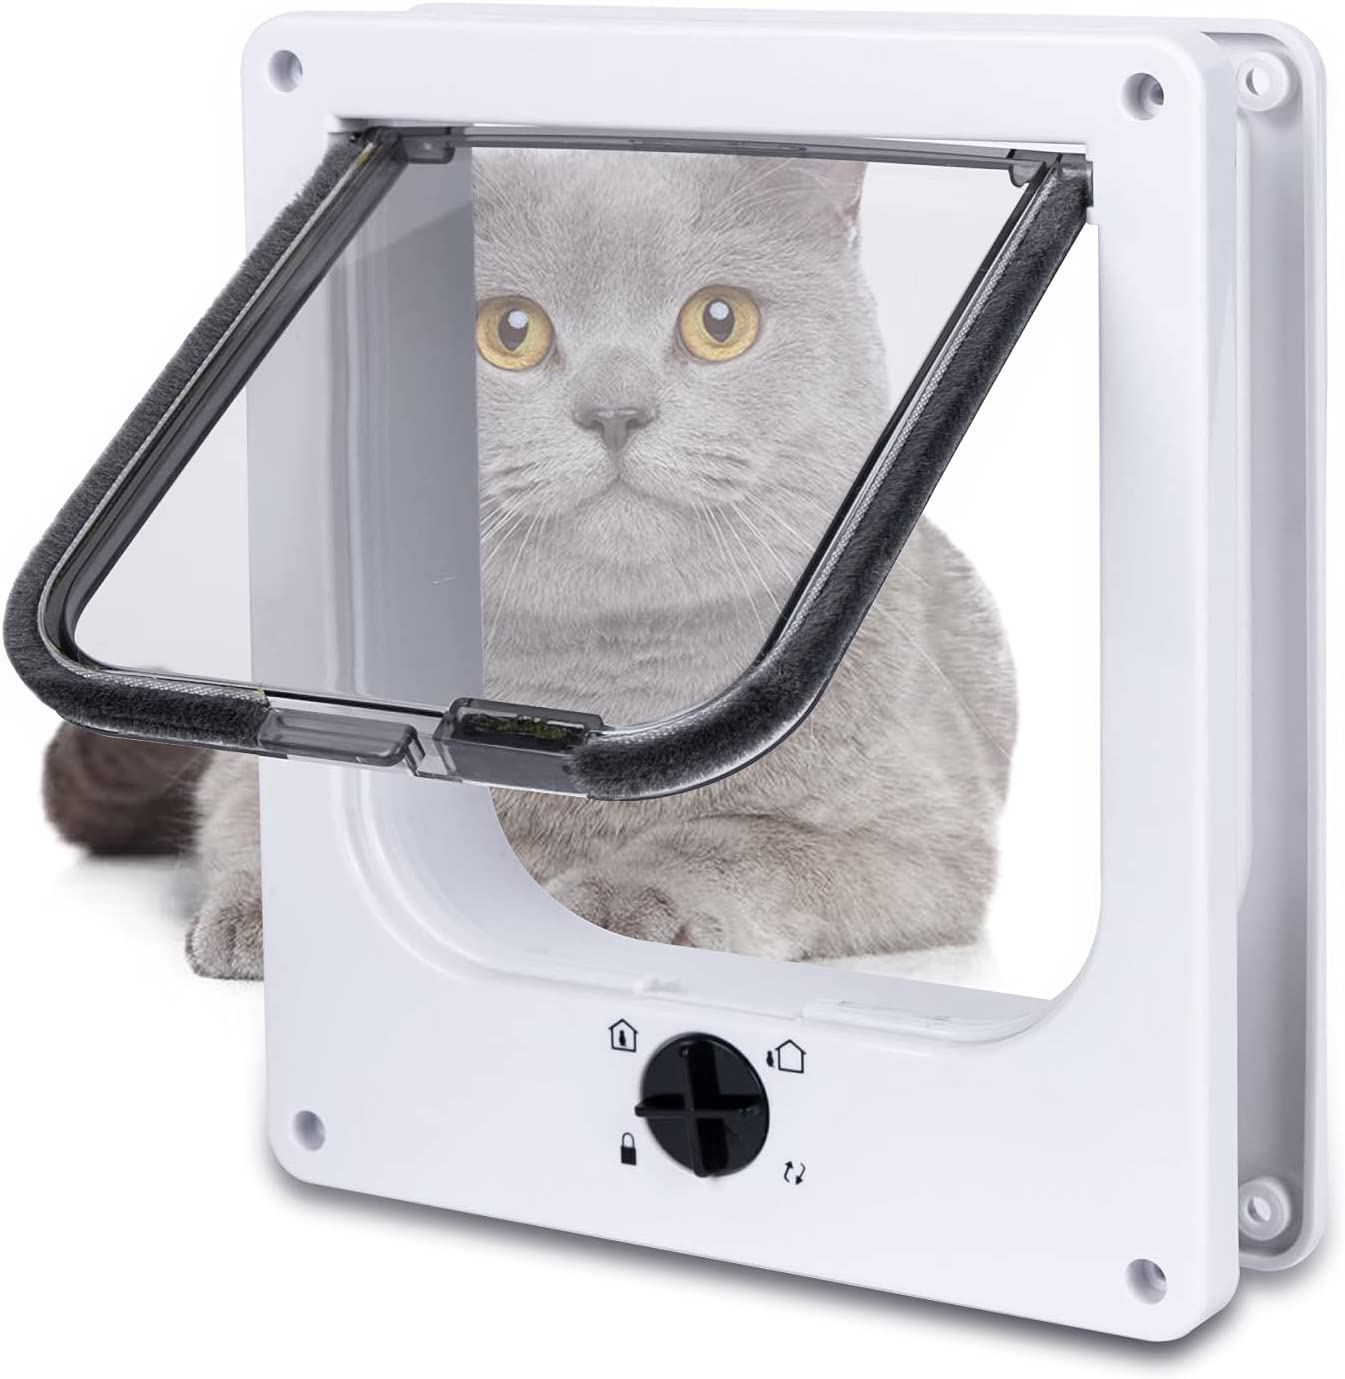 【Upgraded Version】 EGETOTA Cat Doors Flap Inne Bargain Year-end annual account Medium